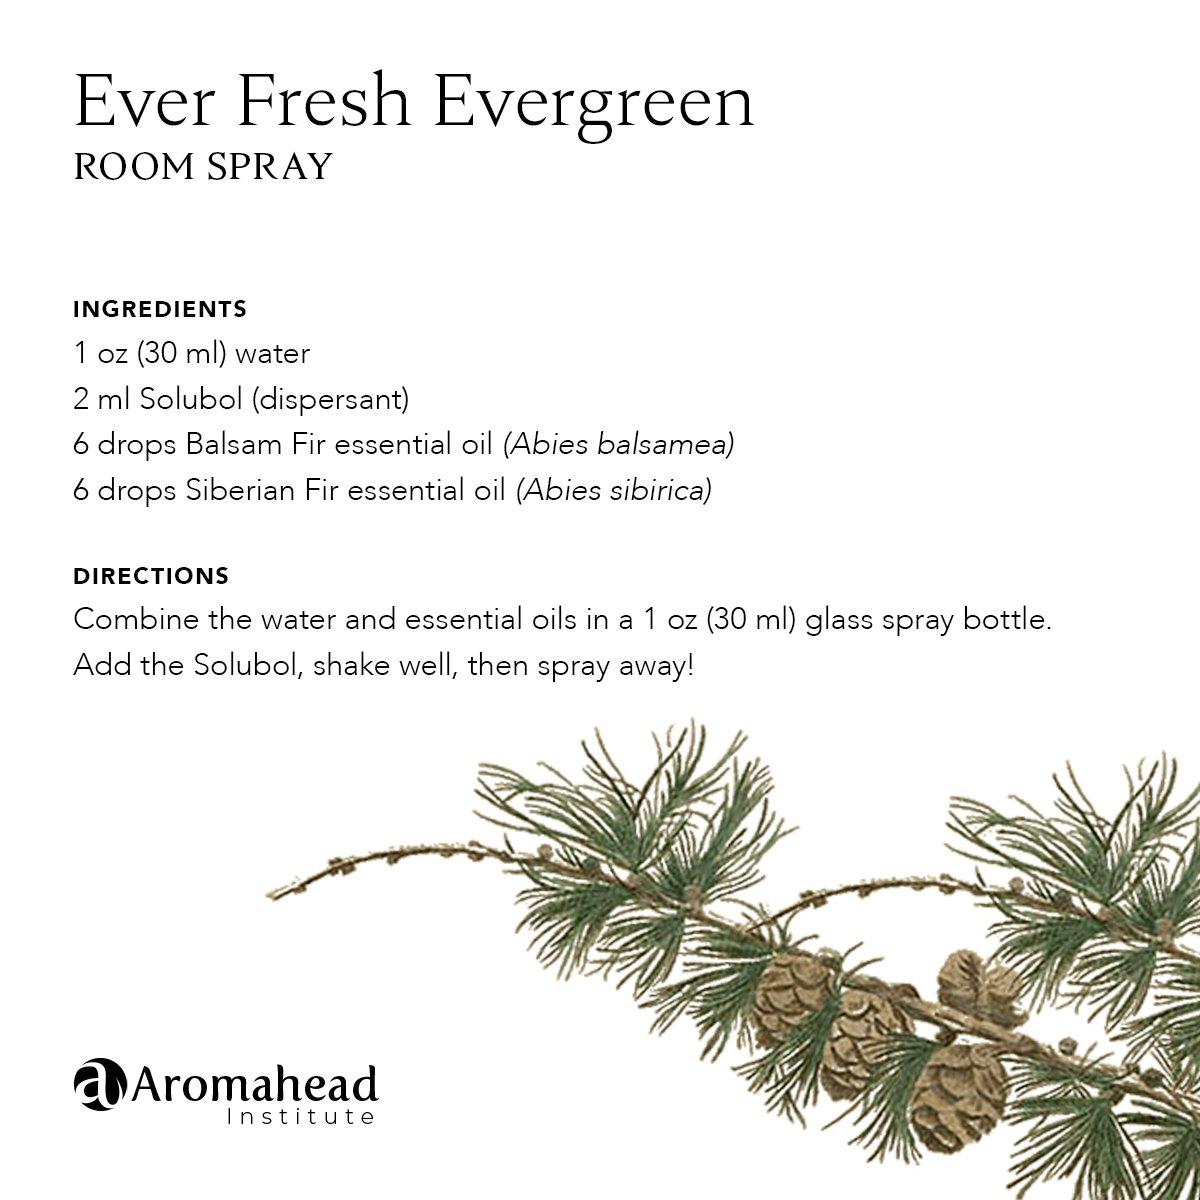 Ever Fresh Evergreen Room Spray